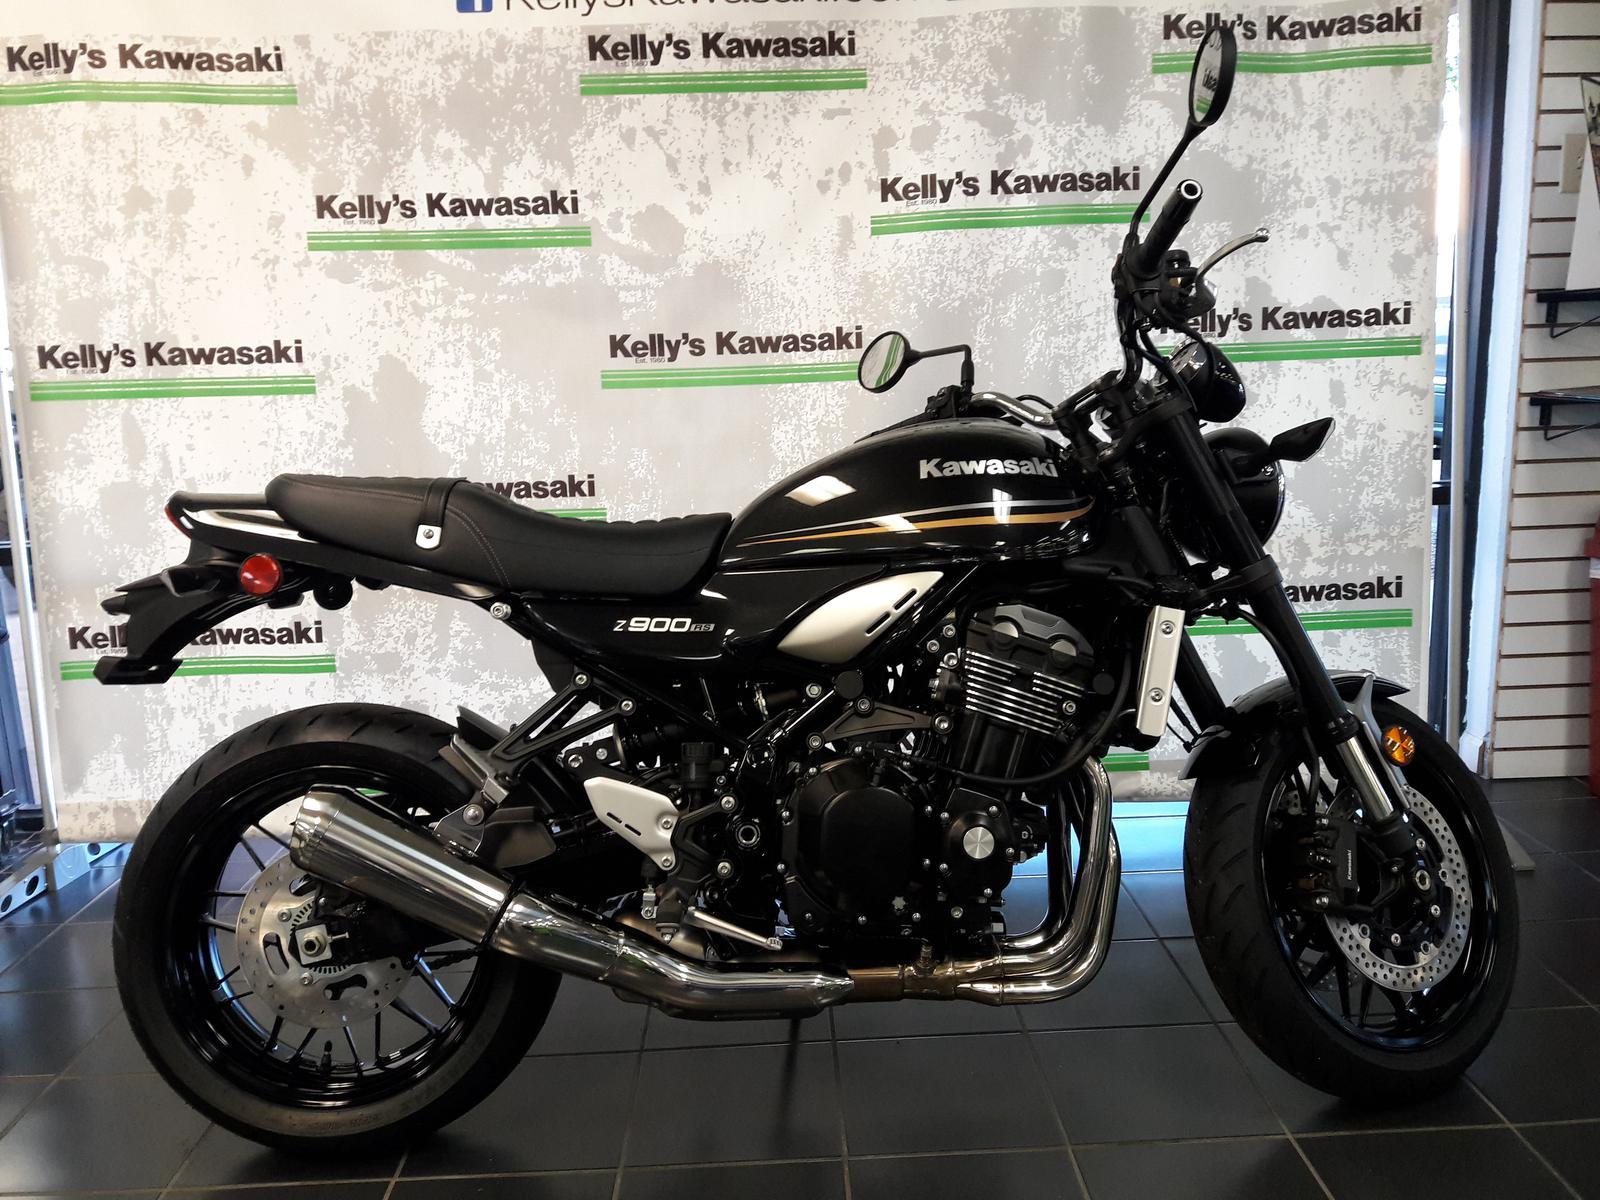 2018 Kawasaki Z 900 RS For Sale In Mesa AZ Kellys